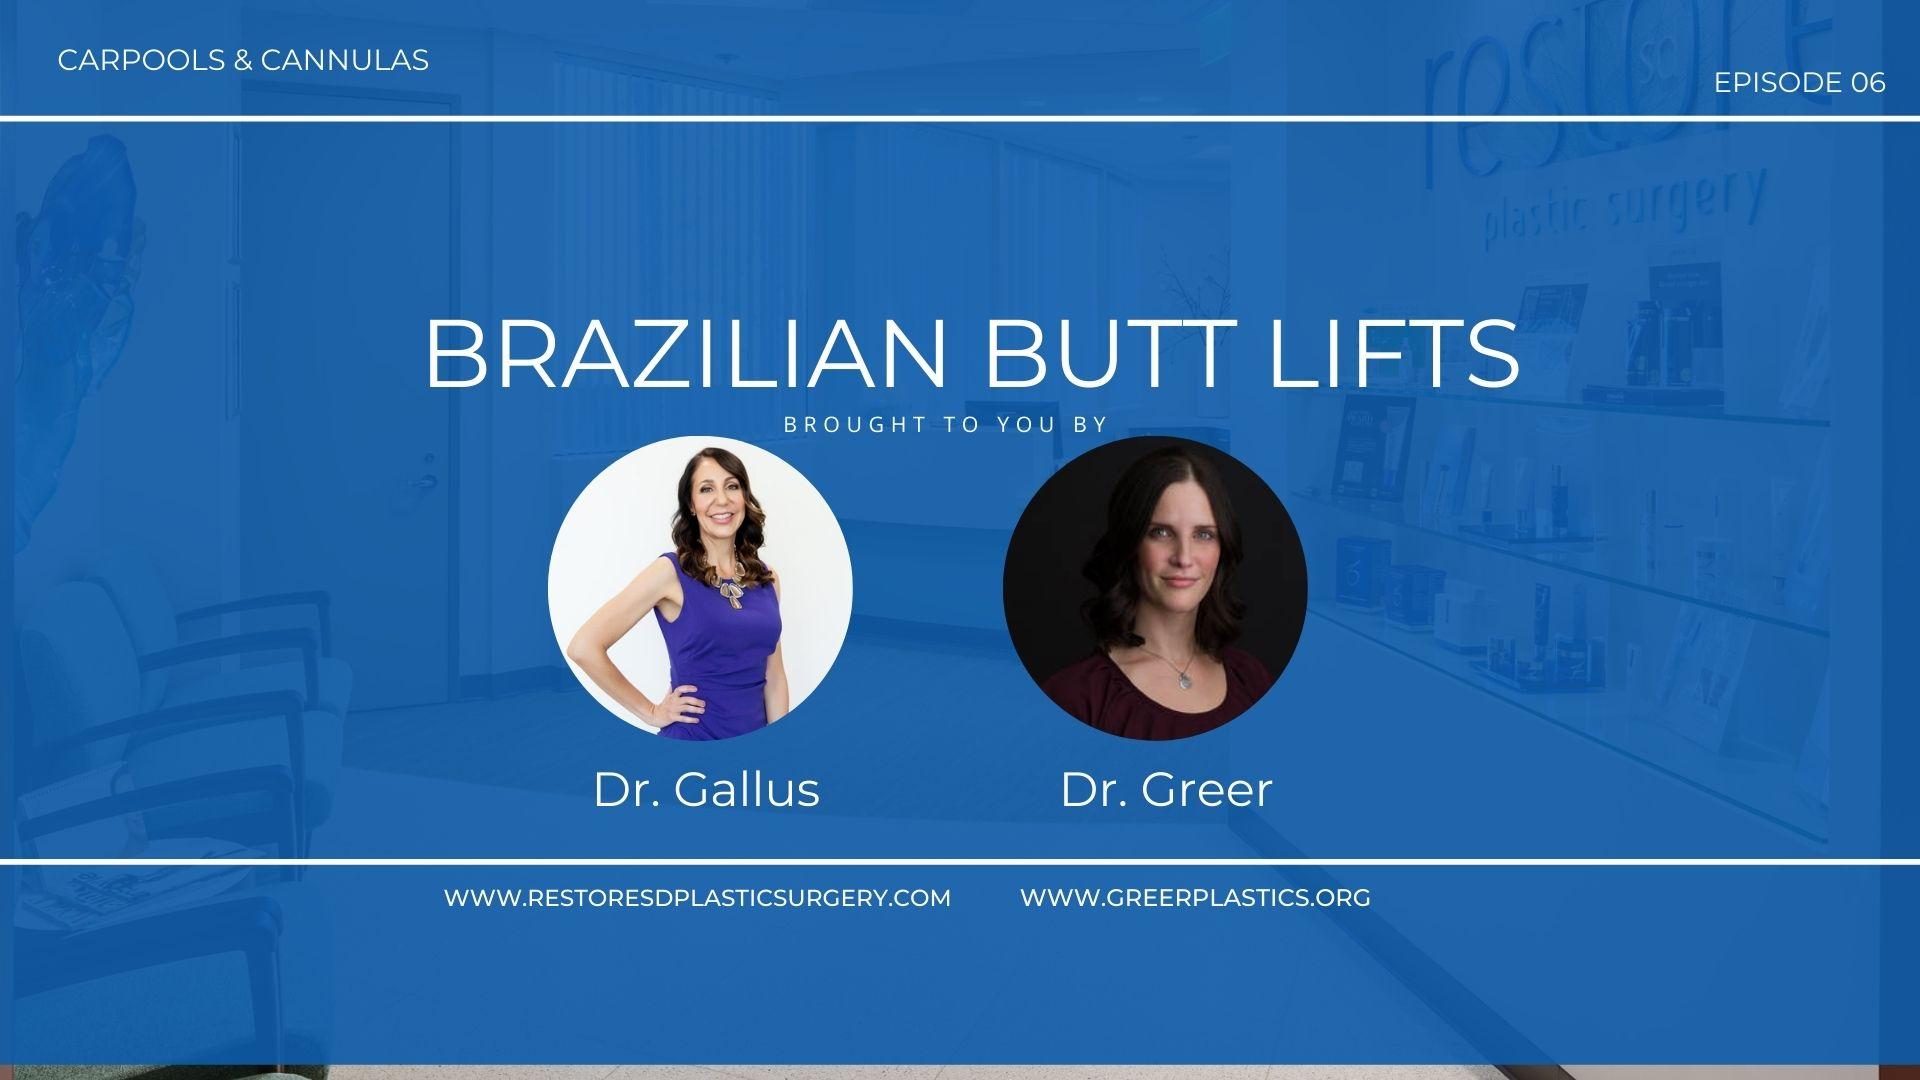 Carpools & Cannulas Episode 6 Brazilian Butt Lifts